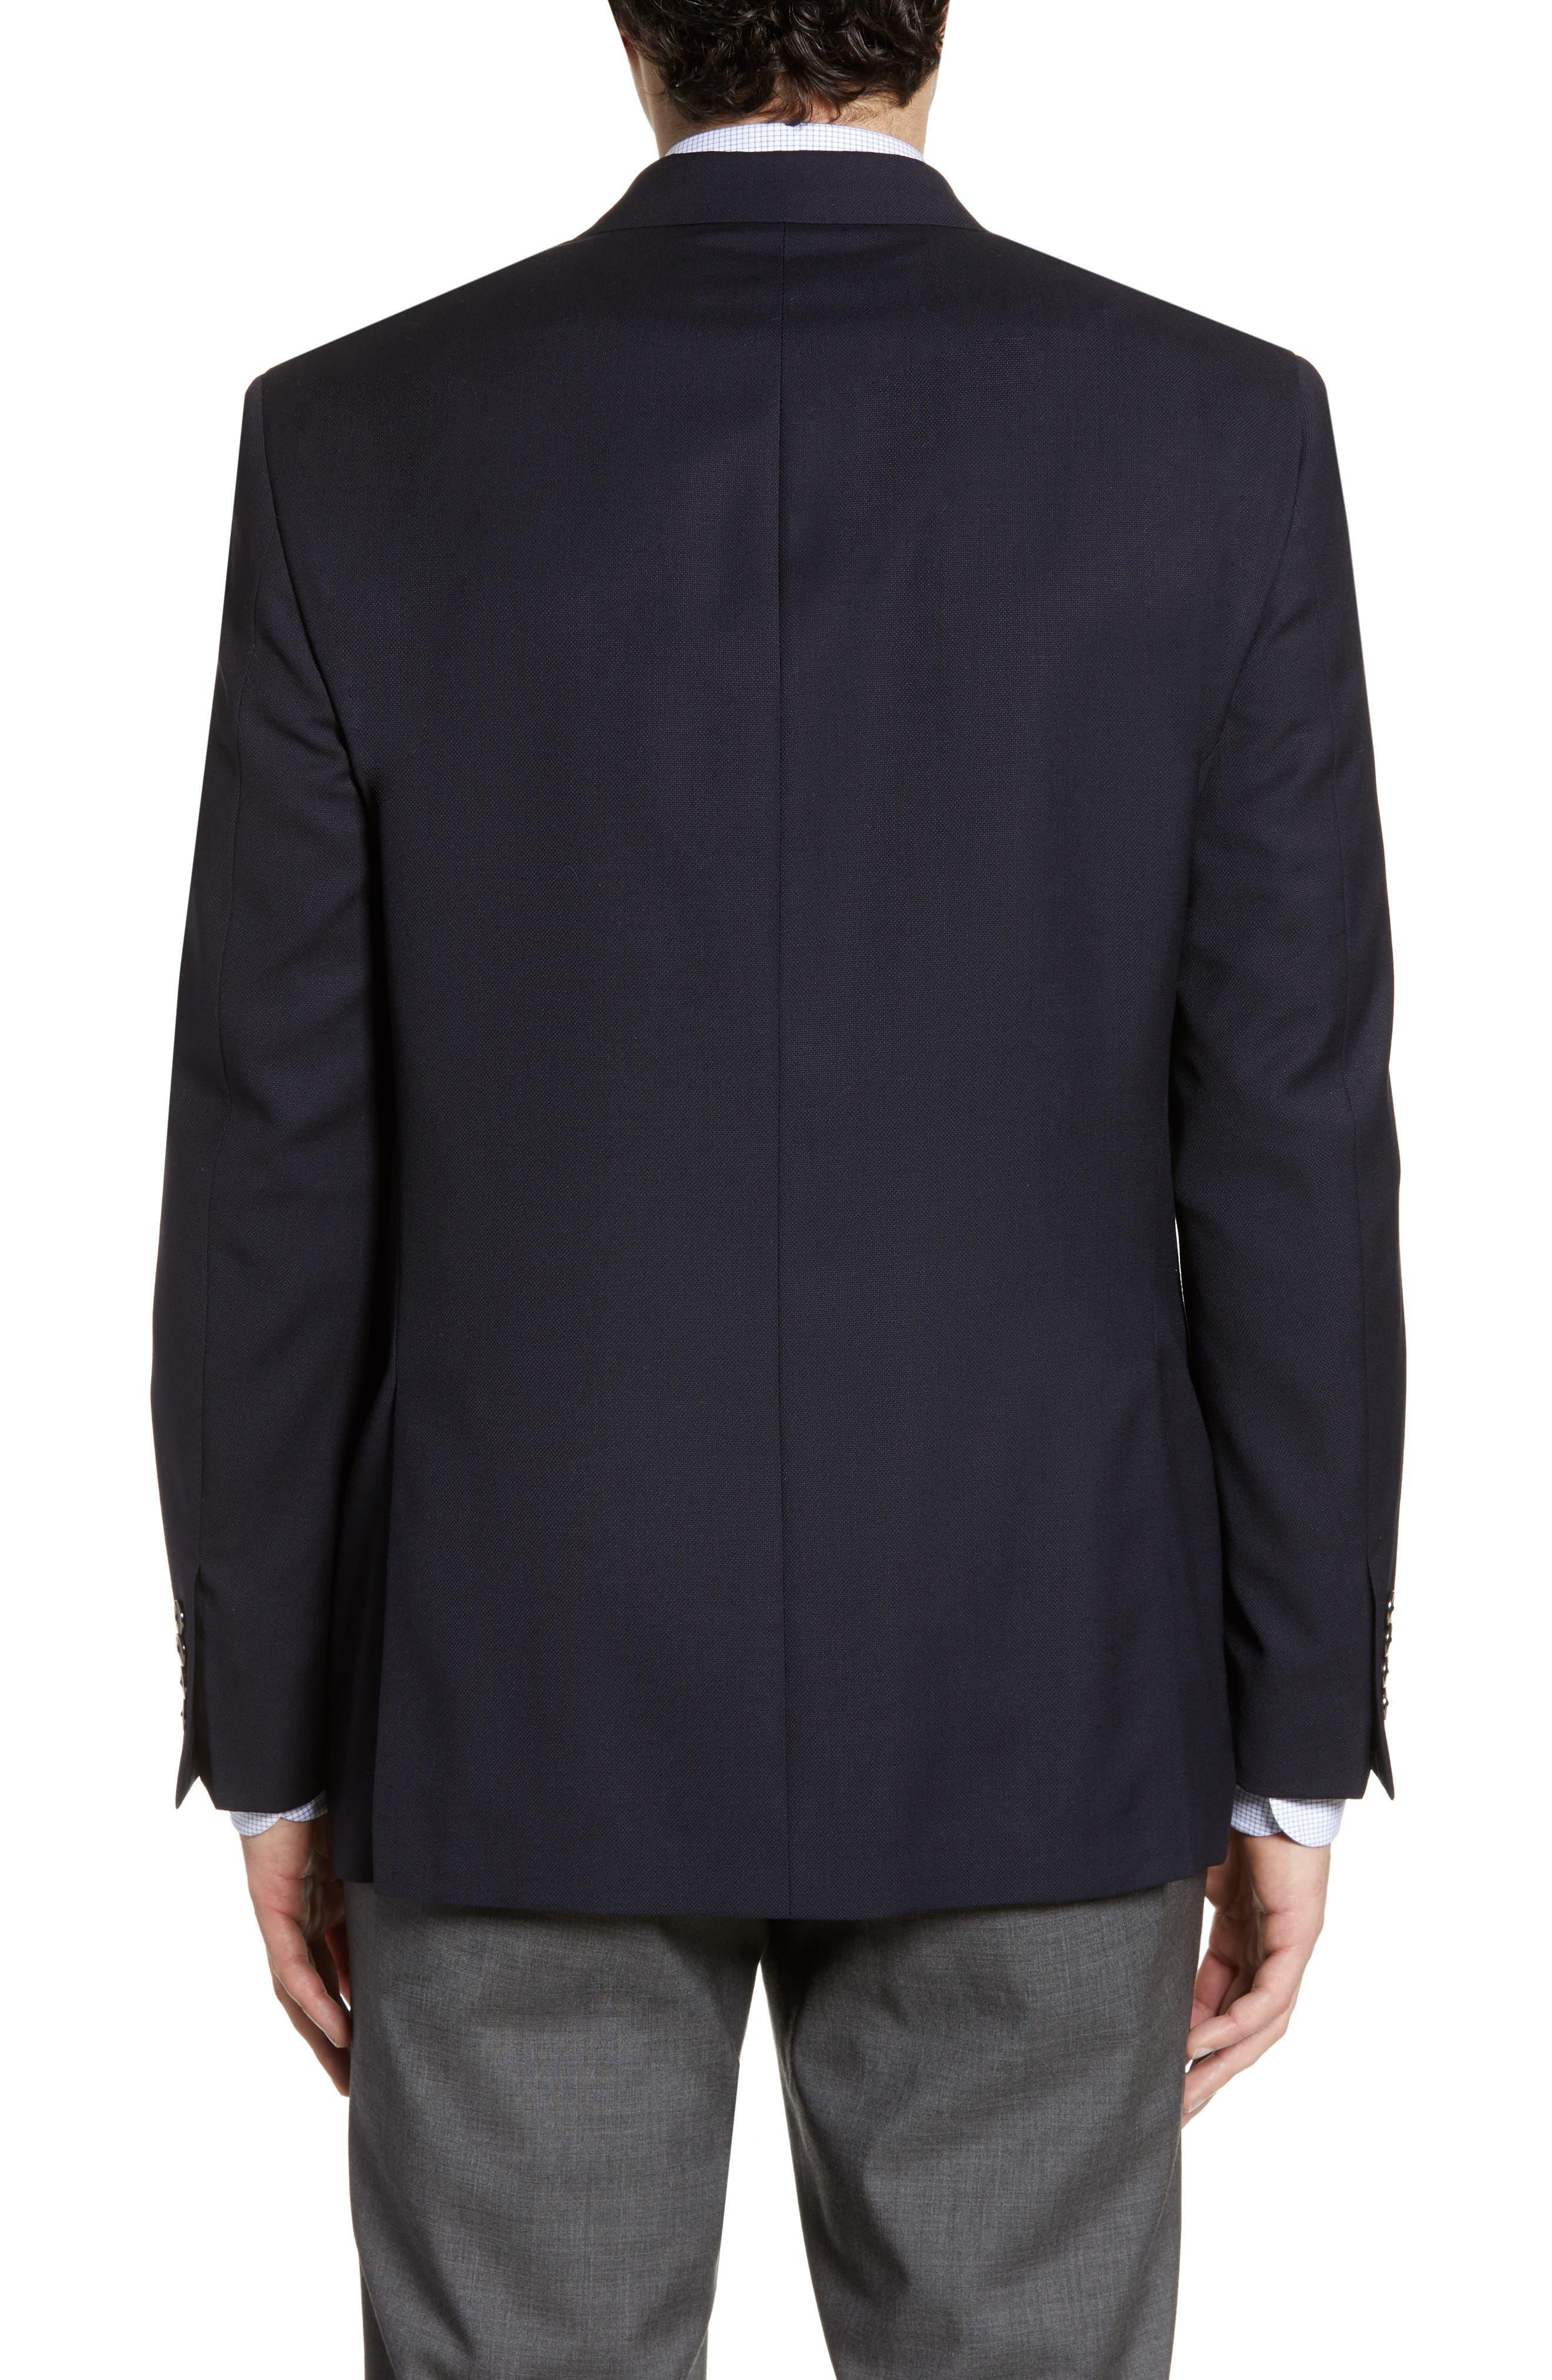 HART SCHAFFNER MARX, New York Classic Fit Wool Blend Blazer, Alternate thumbnail 3, color, NAVY